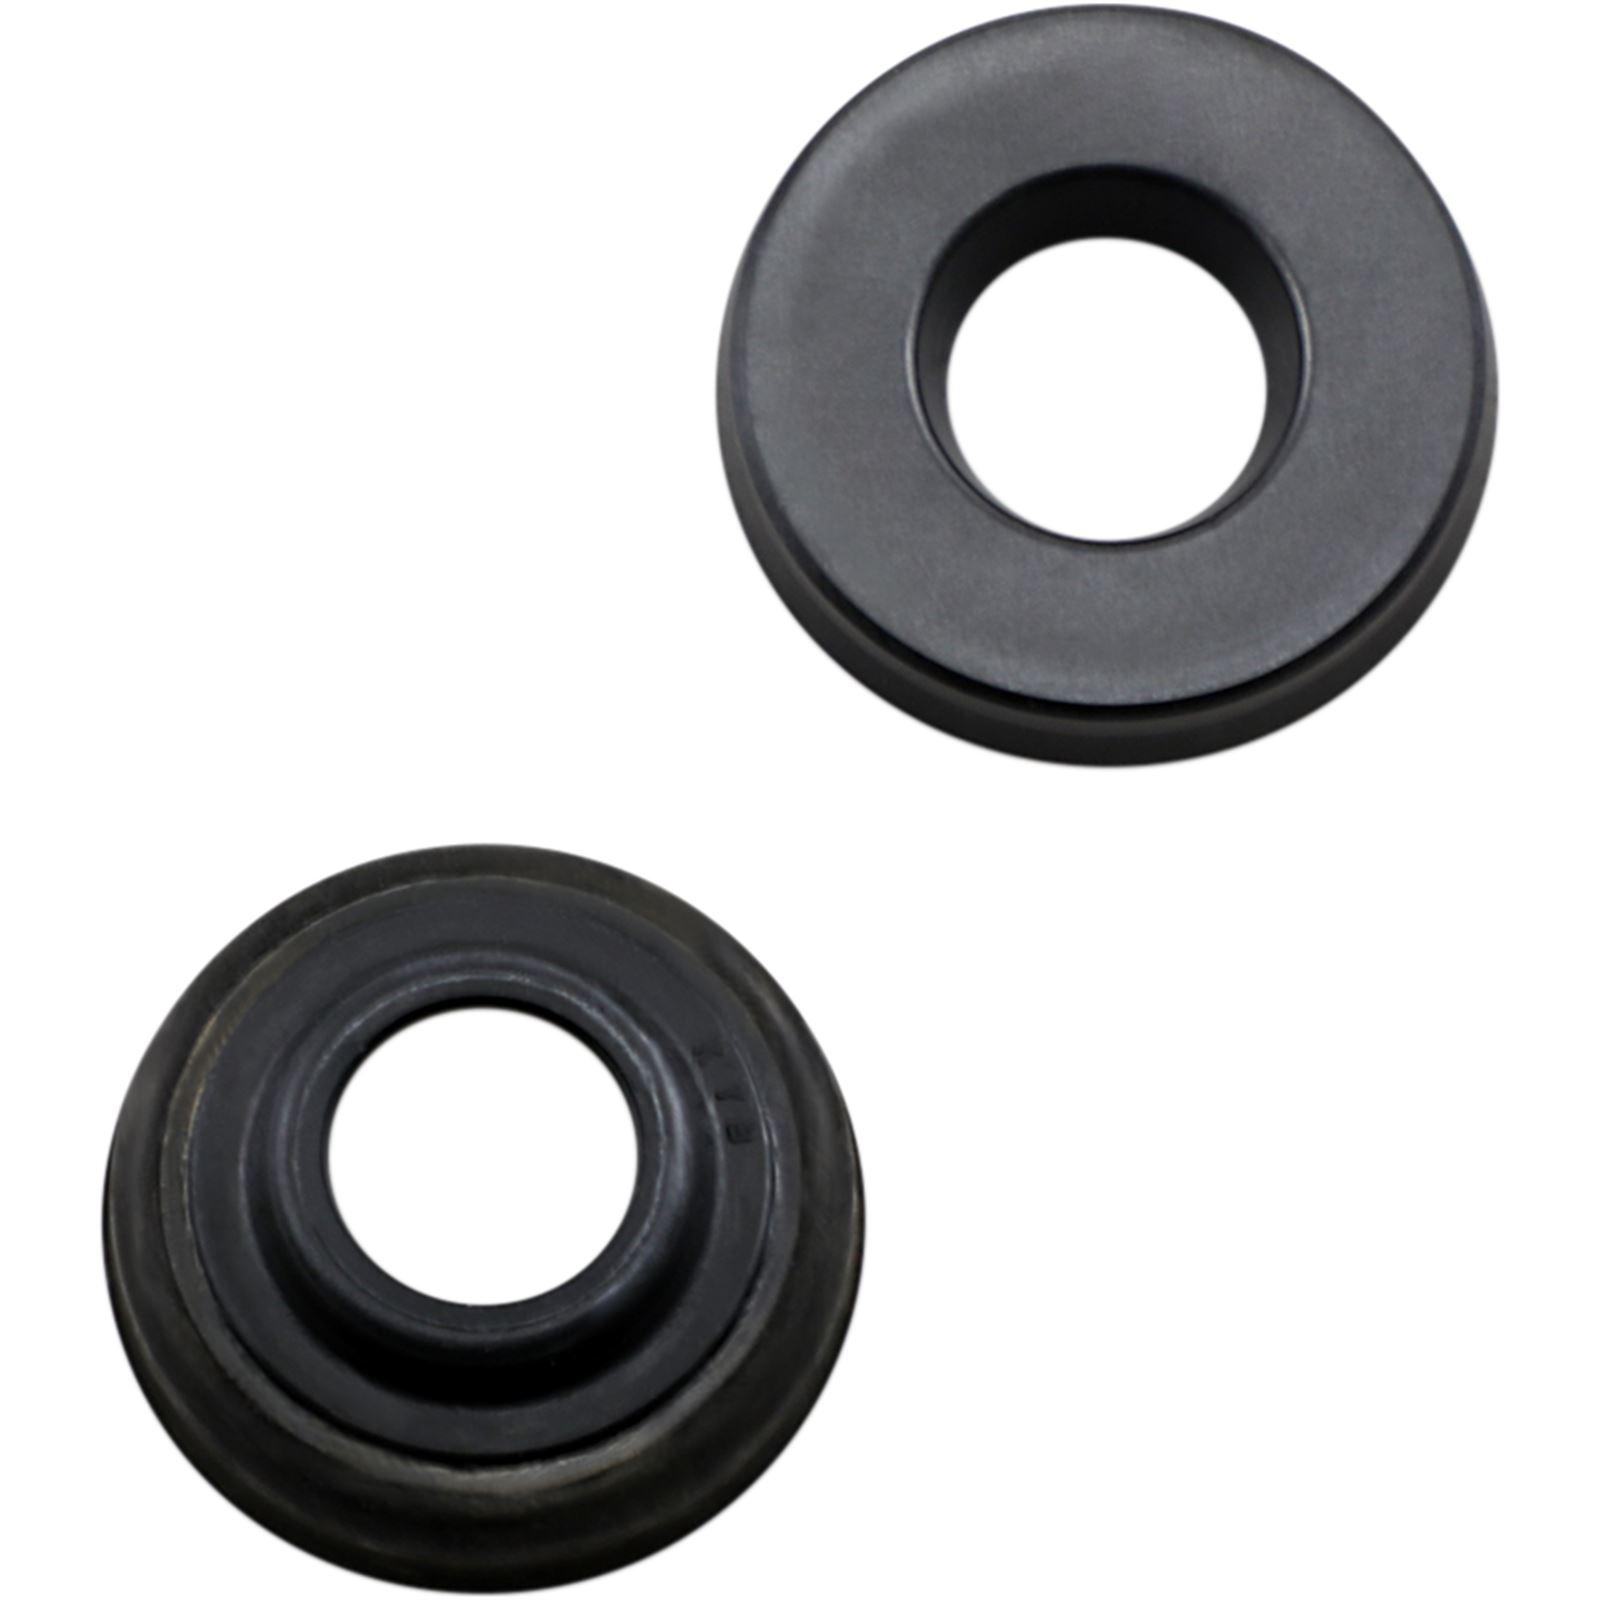 Race Tech Shock Oil Seal Set - 12.5 mm - KYB